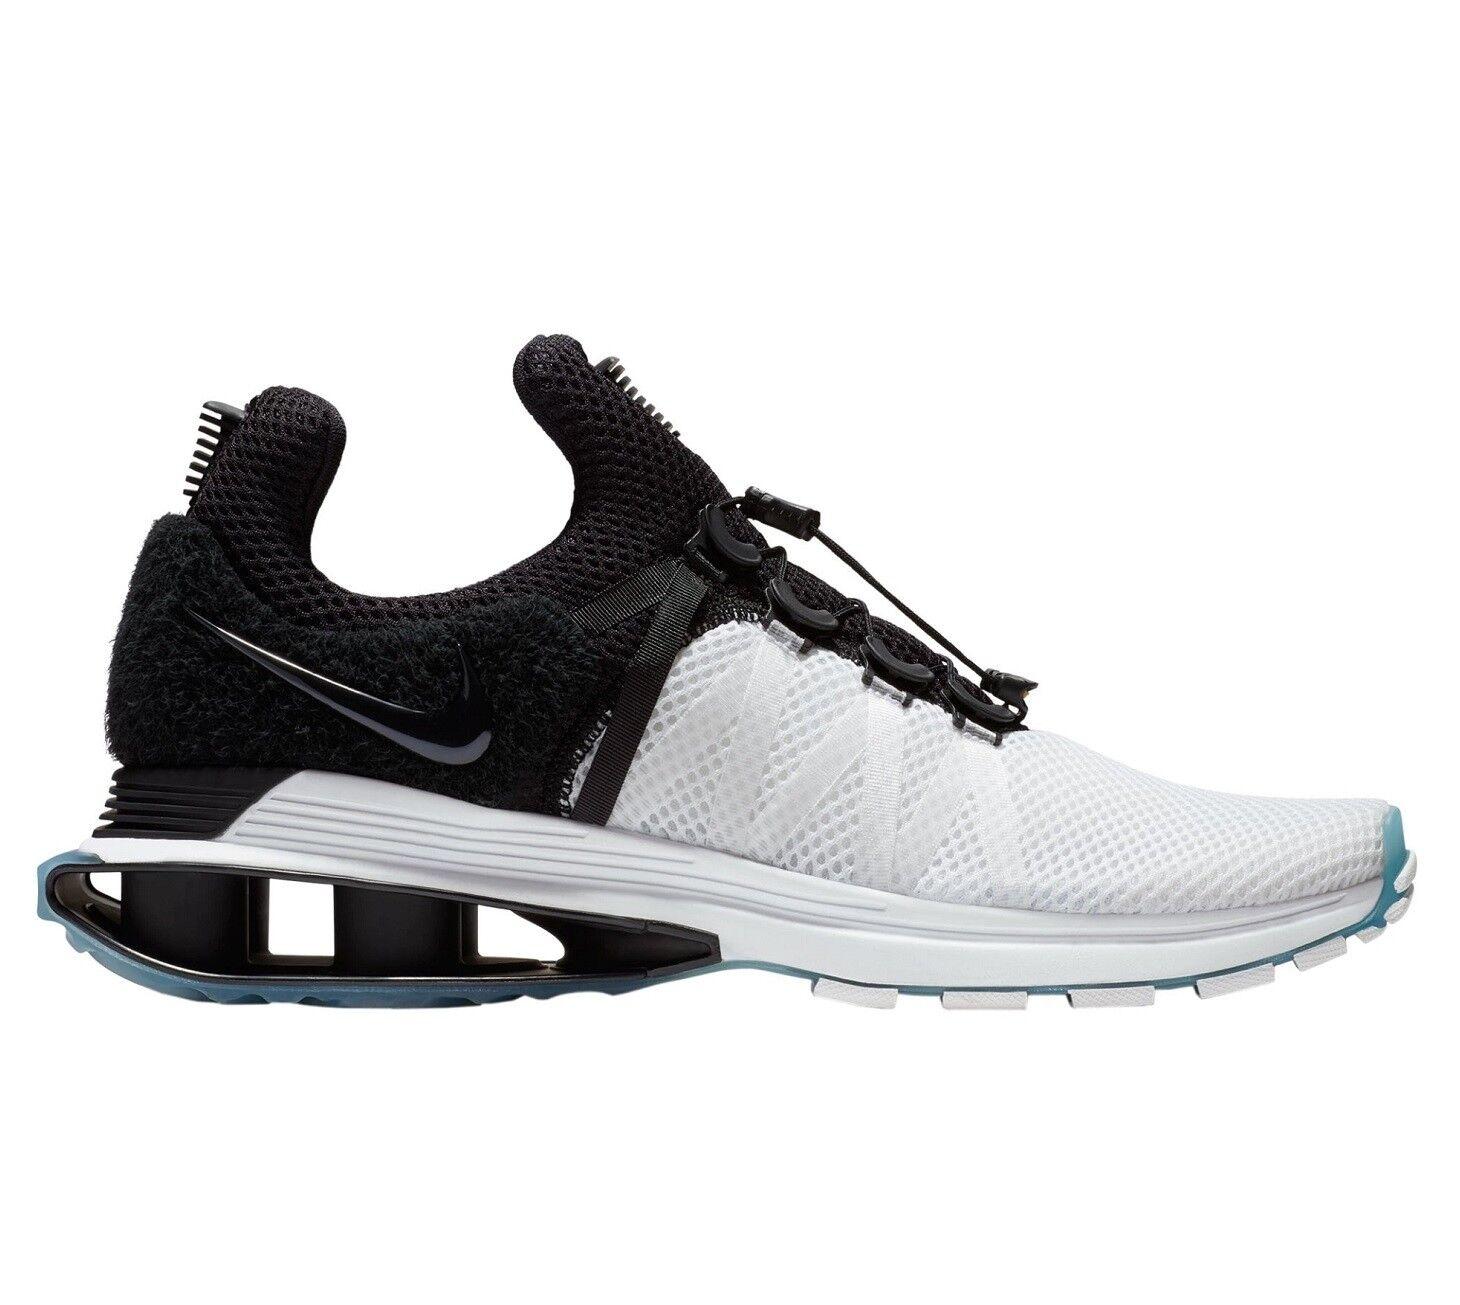 Nike Shox Gravity Mens AR1999-101 White Black Mesh Running Shoes Size 13